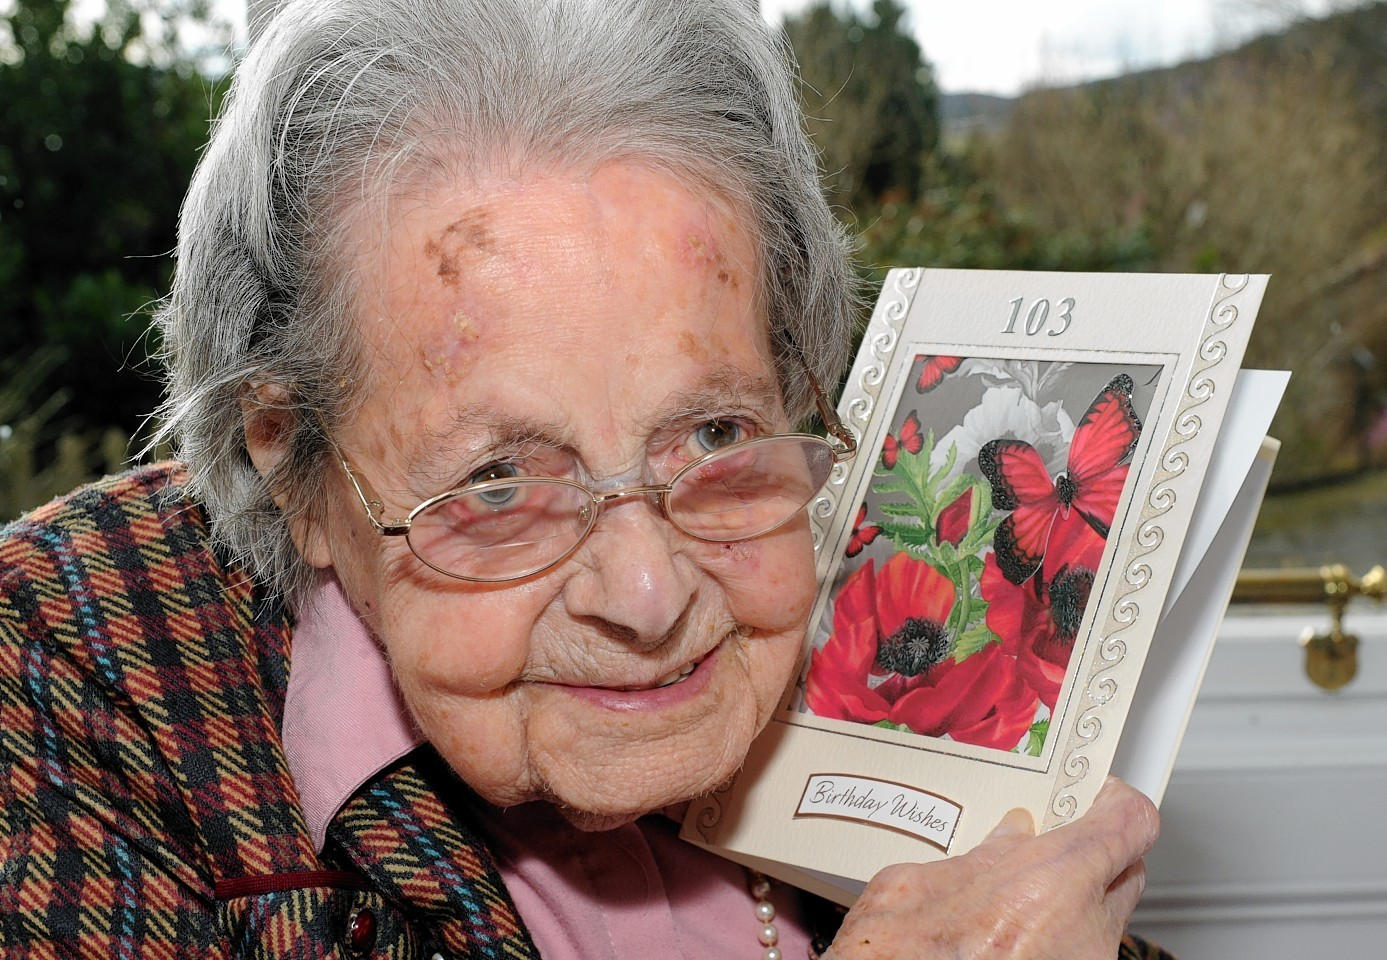 Janet Cruickshank celebrates her 103rd birthday